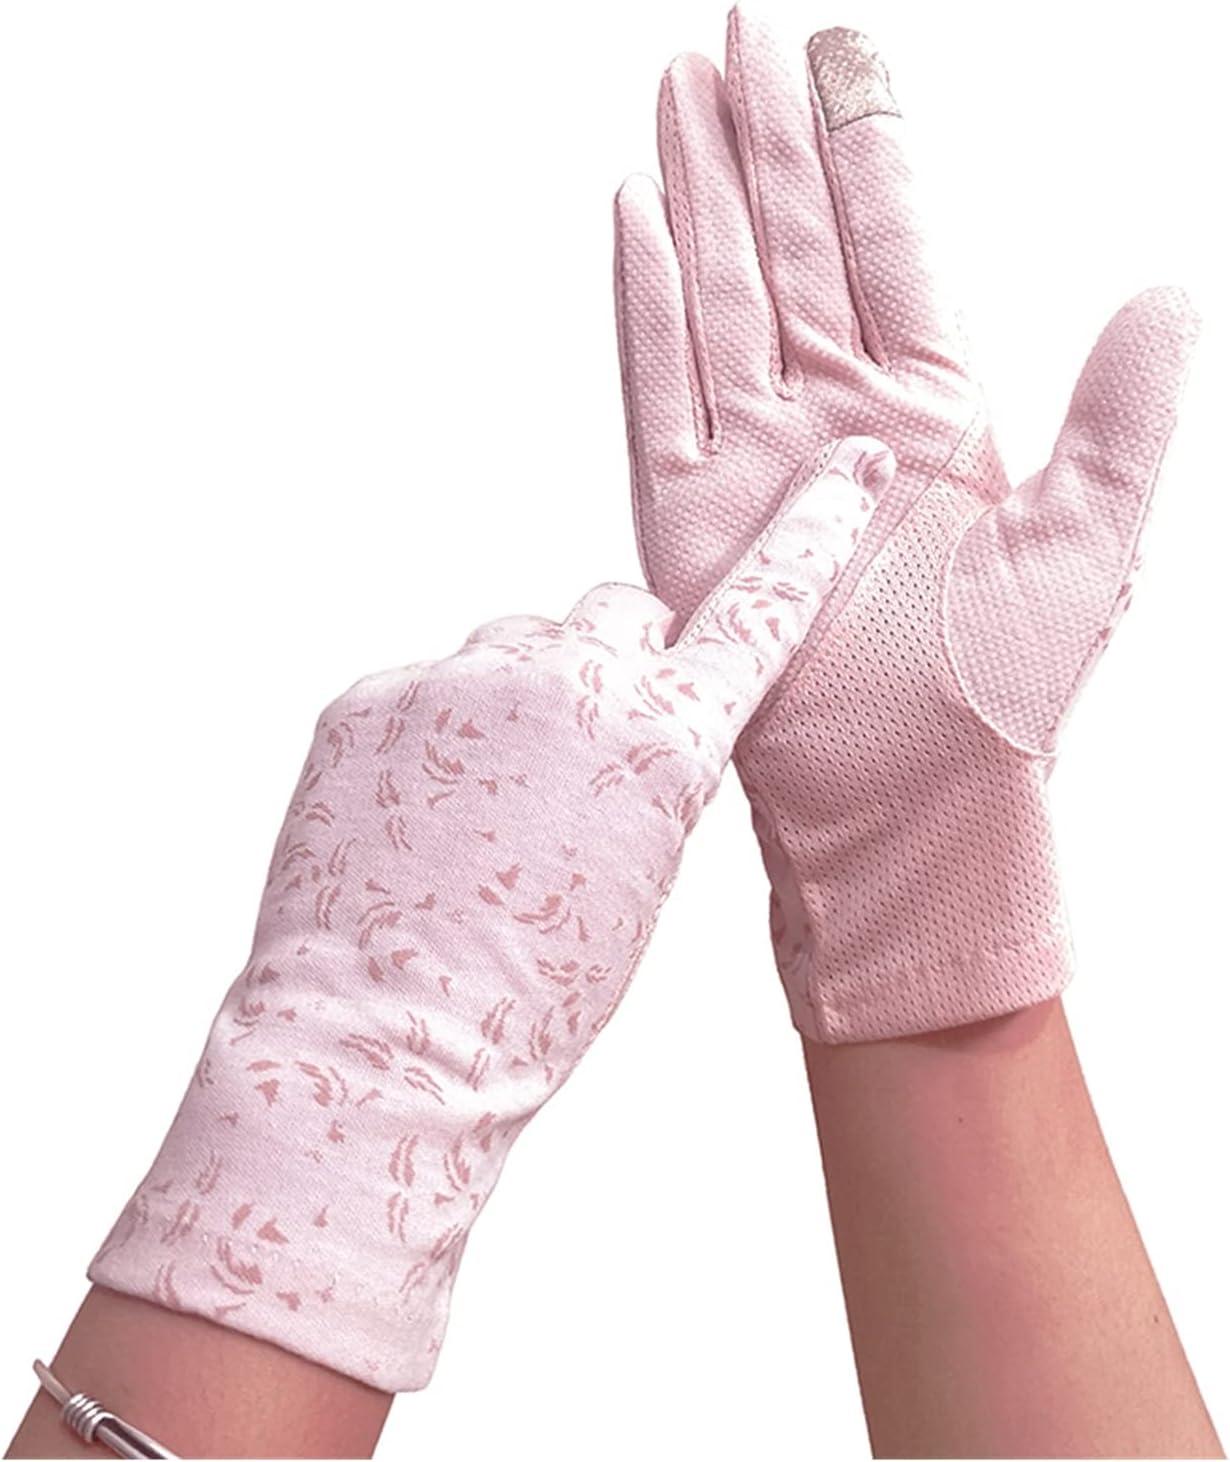 LANREN Women's Summer Driving Gloves Non-Slip Block UV Touch Screen Gloves Breathable Cotton Gloves for Women (Color : 13, Gloves Size : One Size)